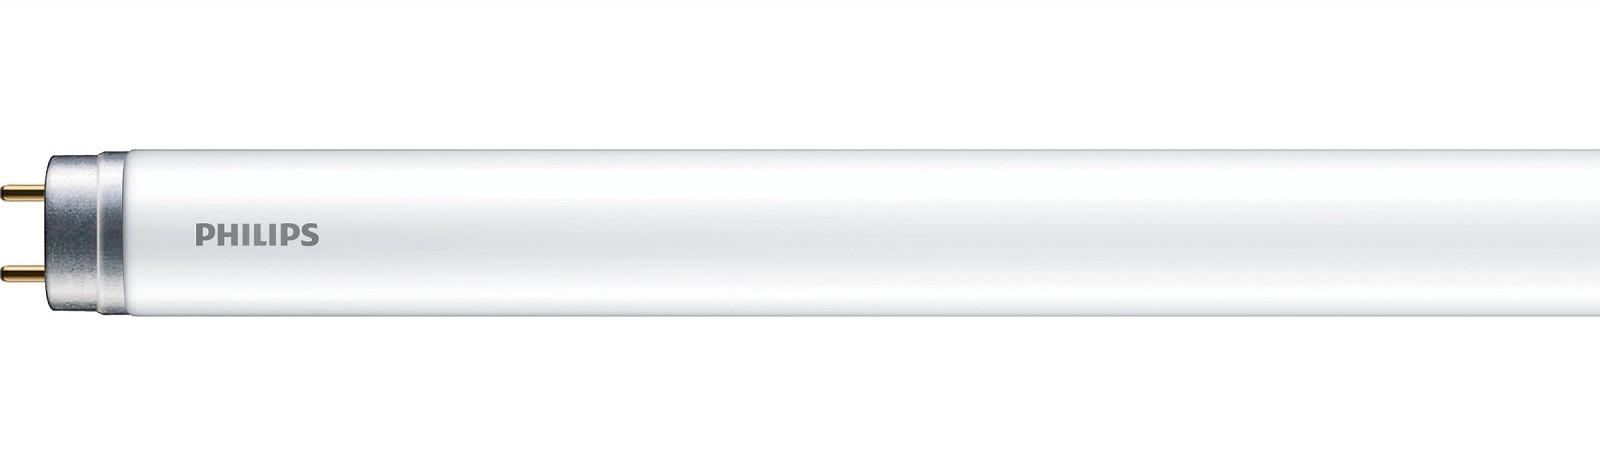 Tub LED Philips Ecofit T8, 16W, 1600 lm, 1200 mm, lumina naturala 4000K